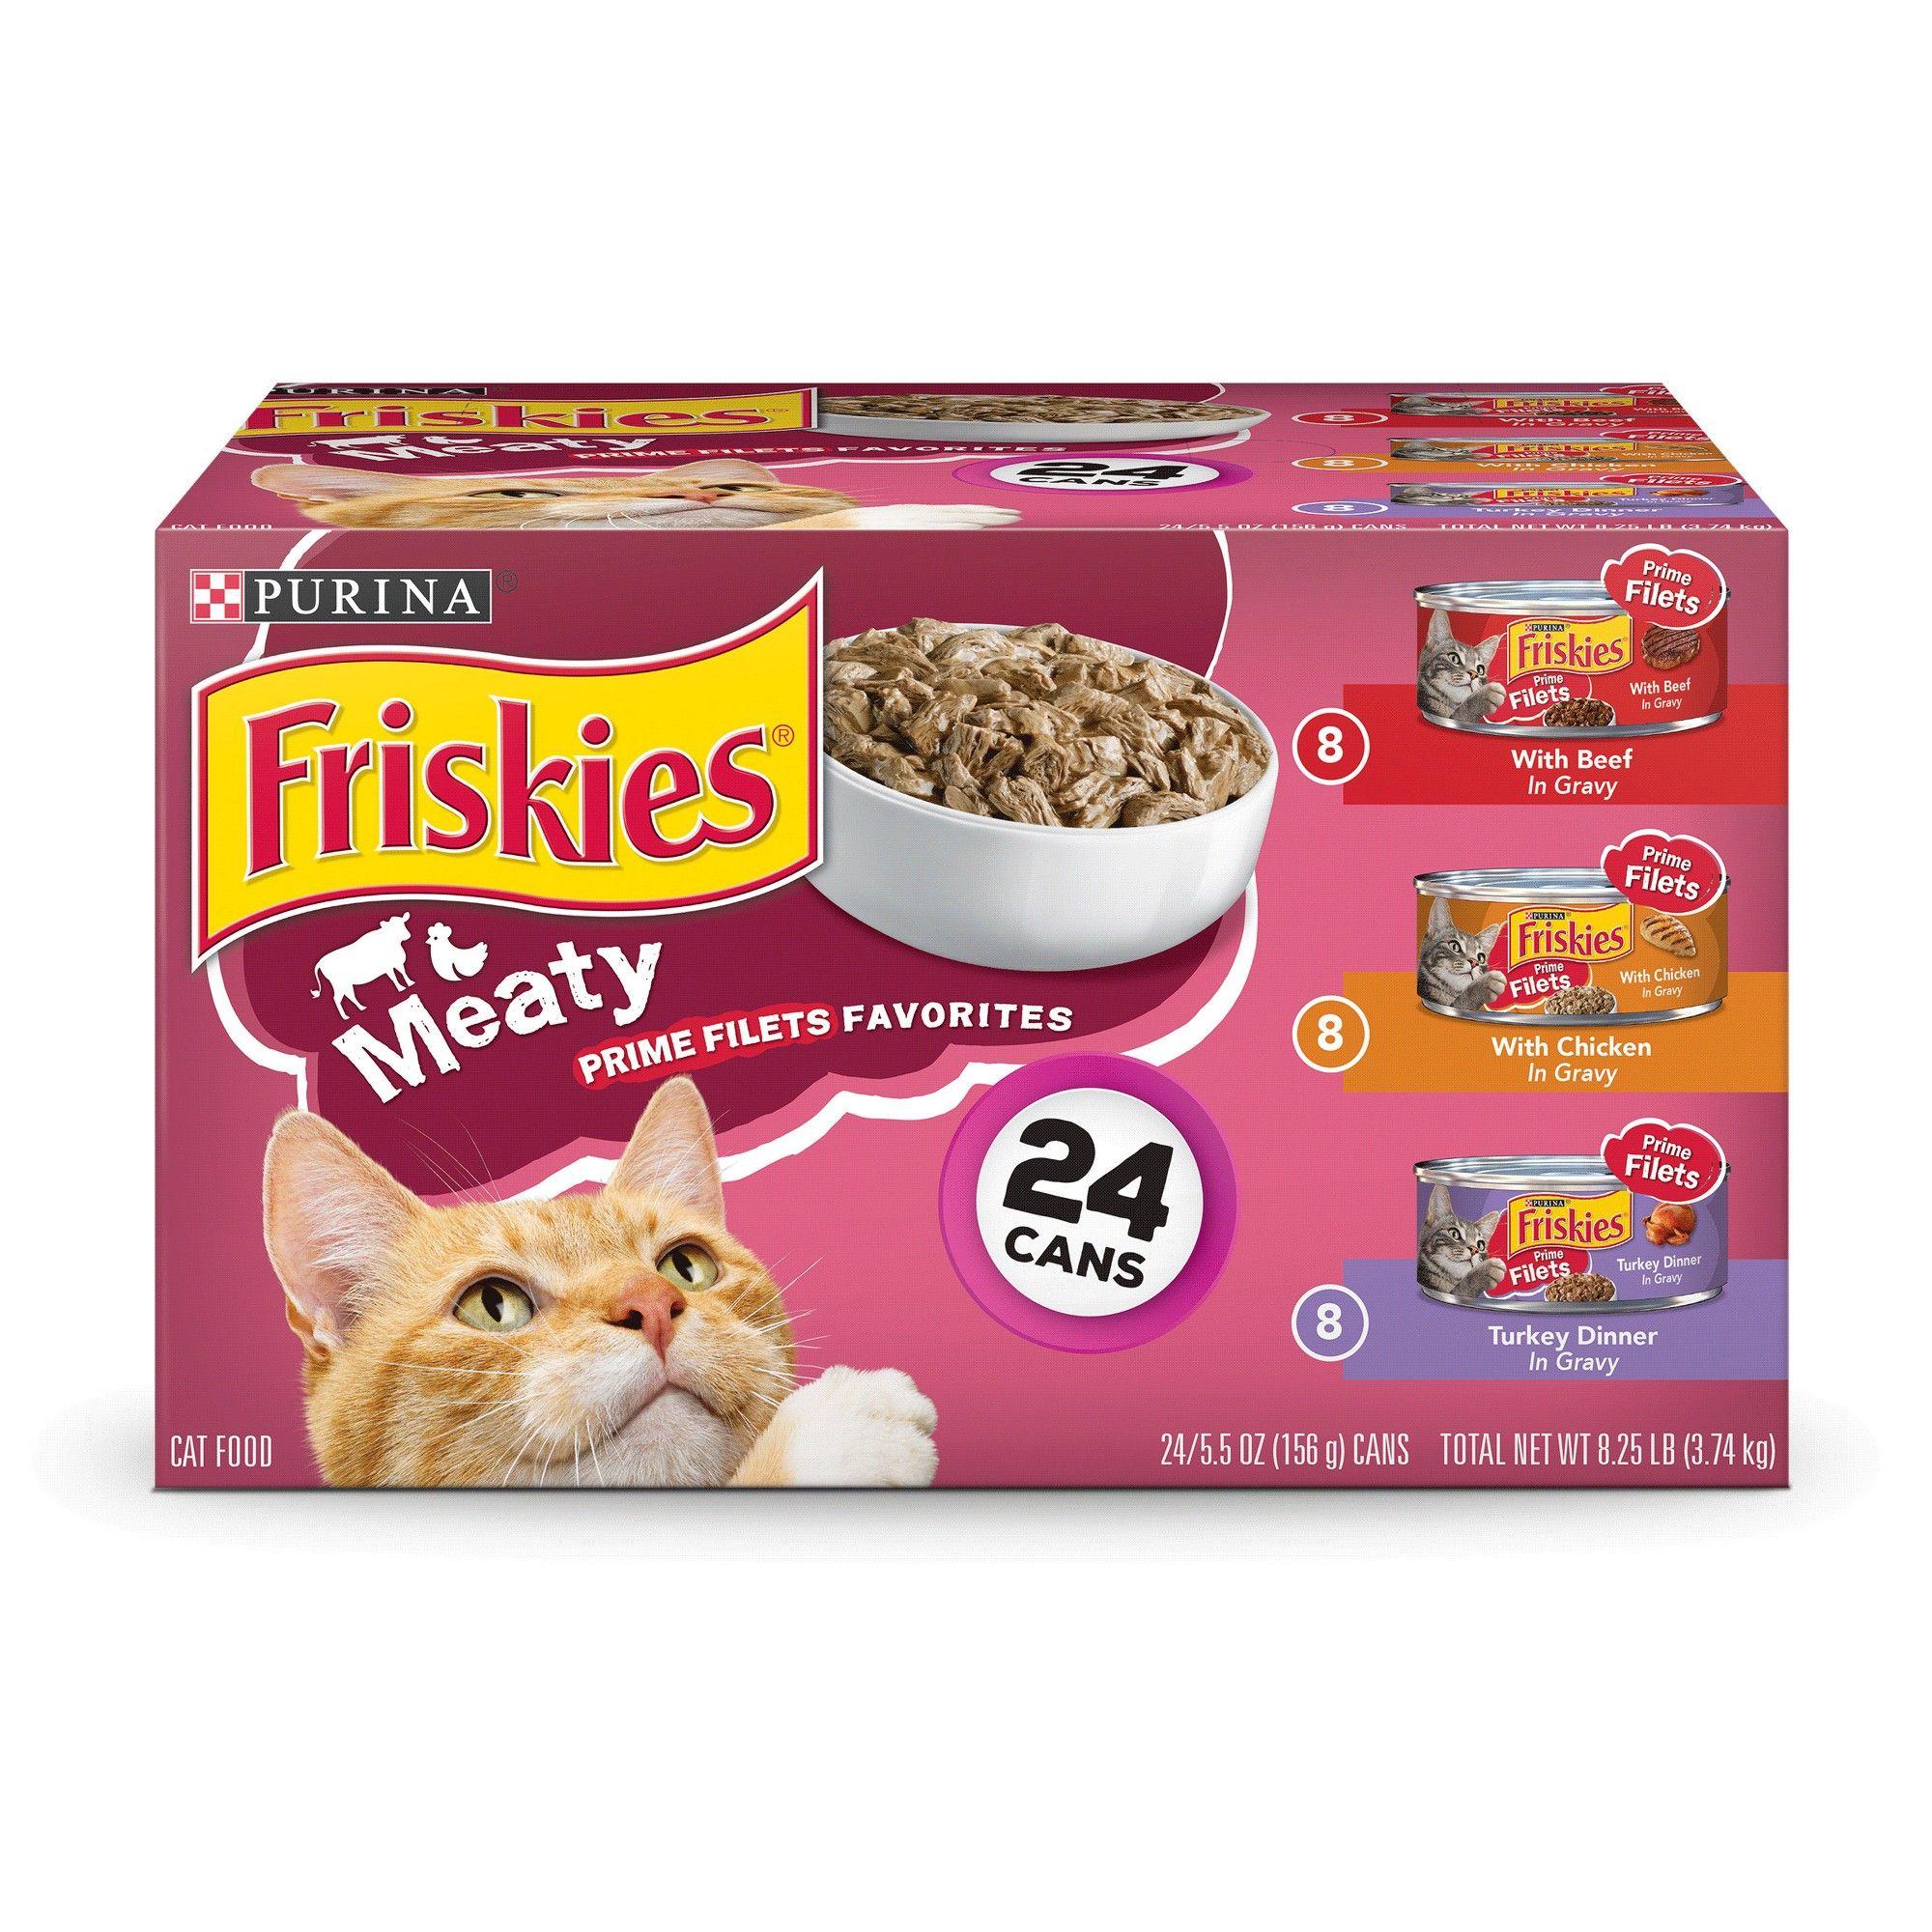 Friskies Prime Filets Meaty Favorites Variety Pack Wet Cat Food 24ct Cat Food Purina Friskies Dry Cat Food